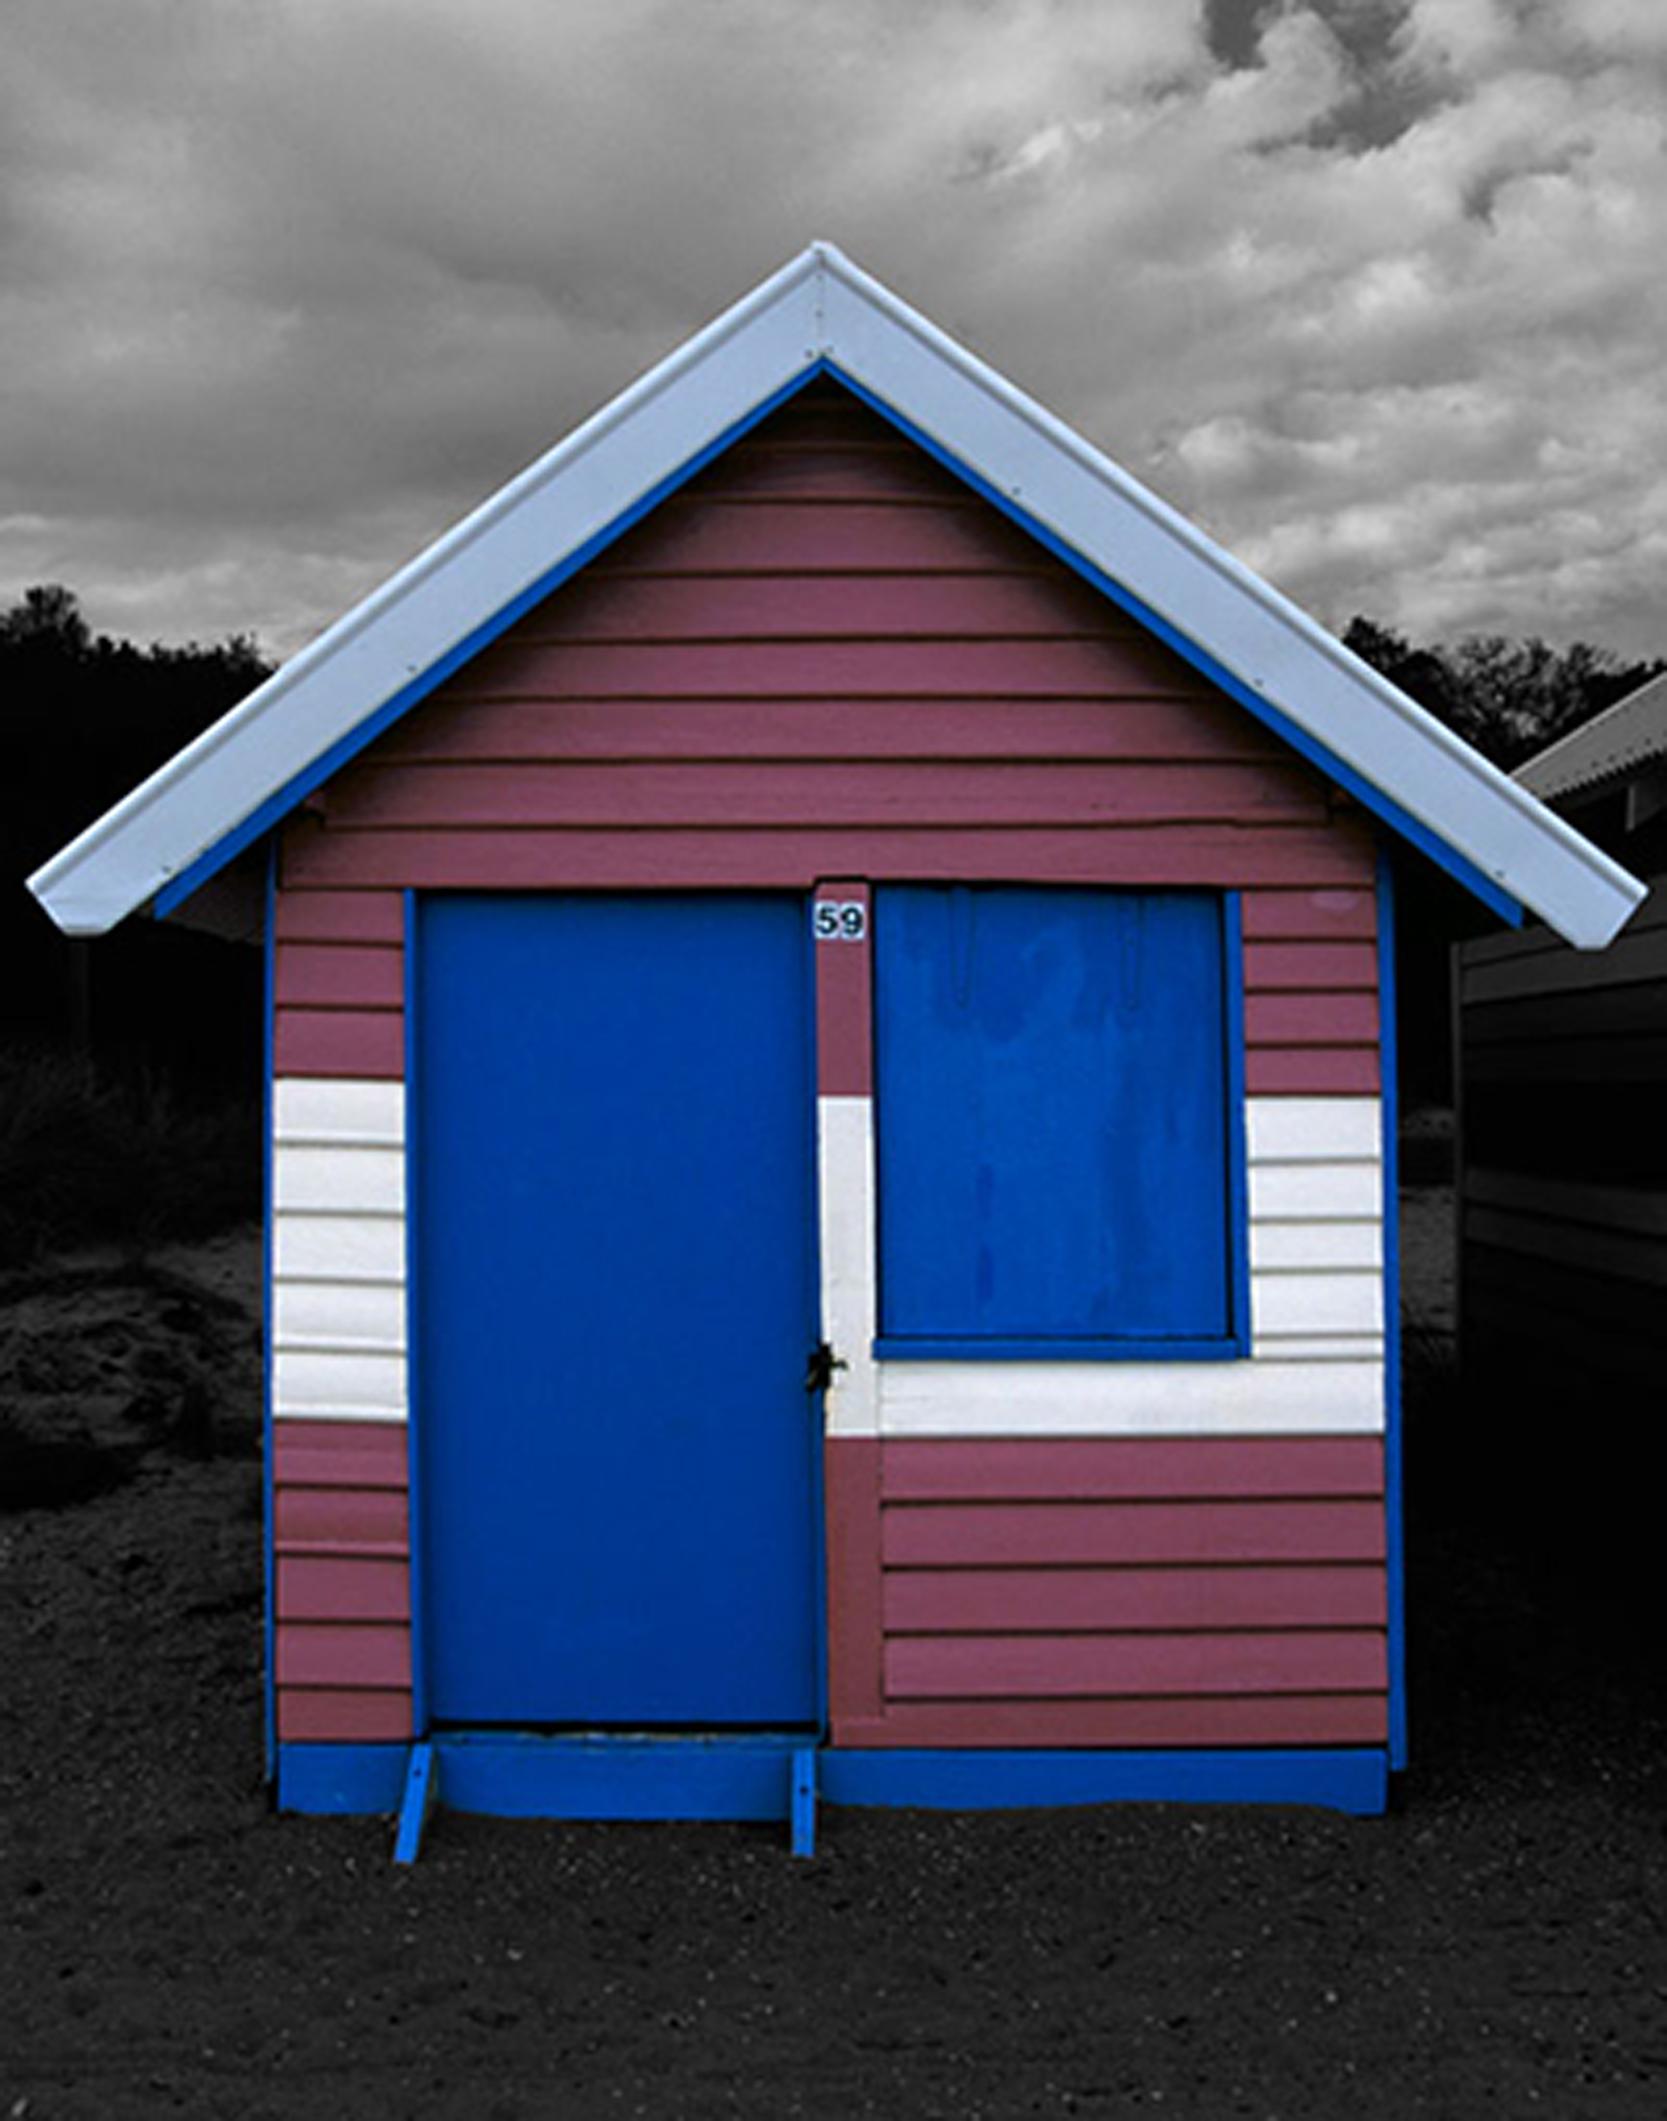 Beach Box #59  20 x 16 inches / 50 x 40 cm, archival pigment print, edition of 15, 2003